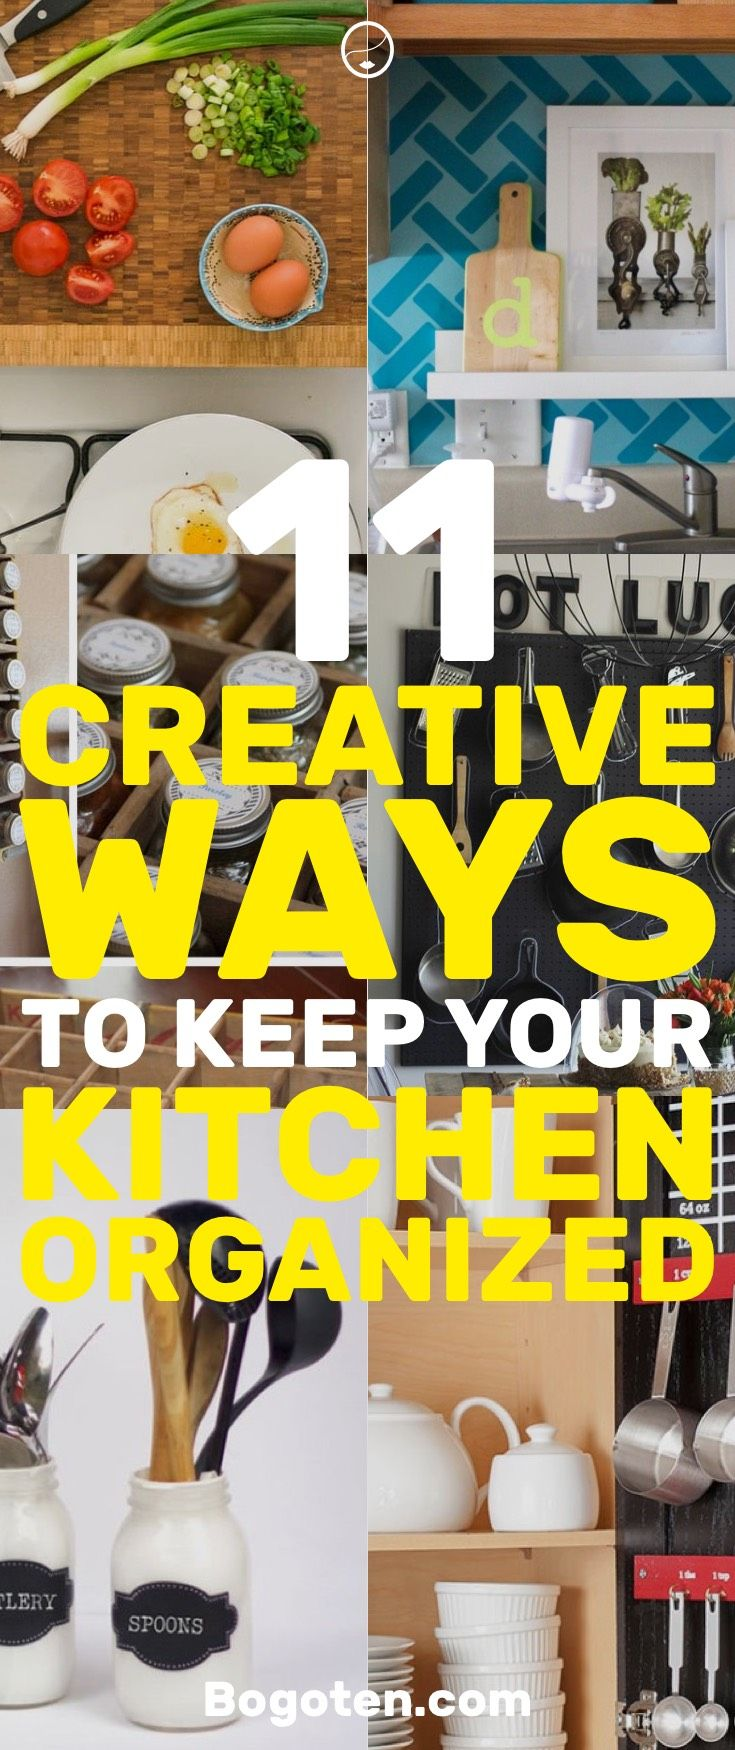 11 Creative Ways To Keep Your Kitchen Organized